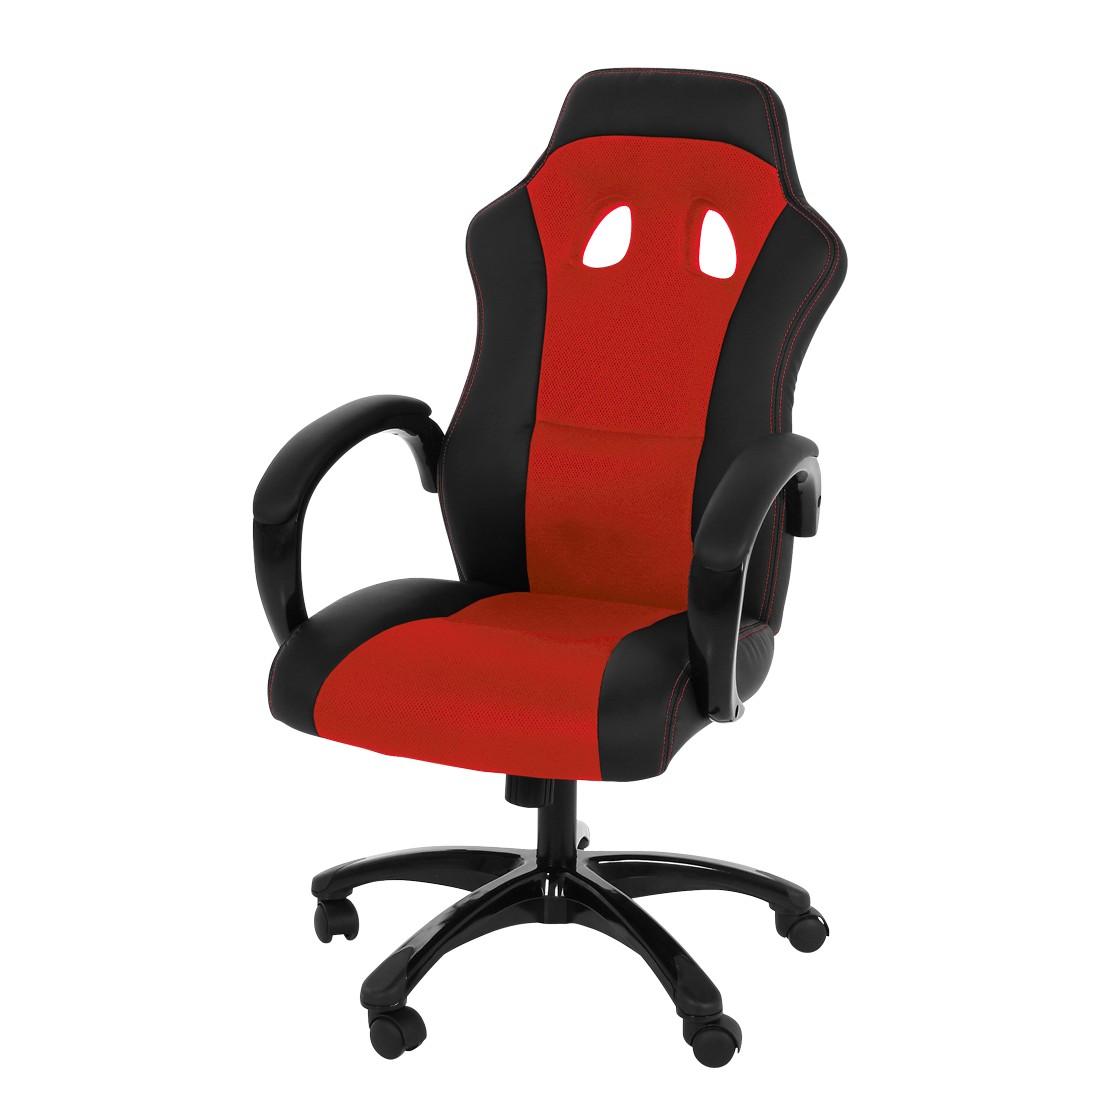 Chefsessel Arlington - Kunstlederbezug - rot/schwarz, loftscape